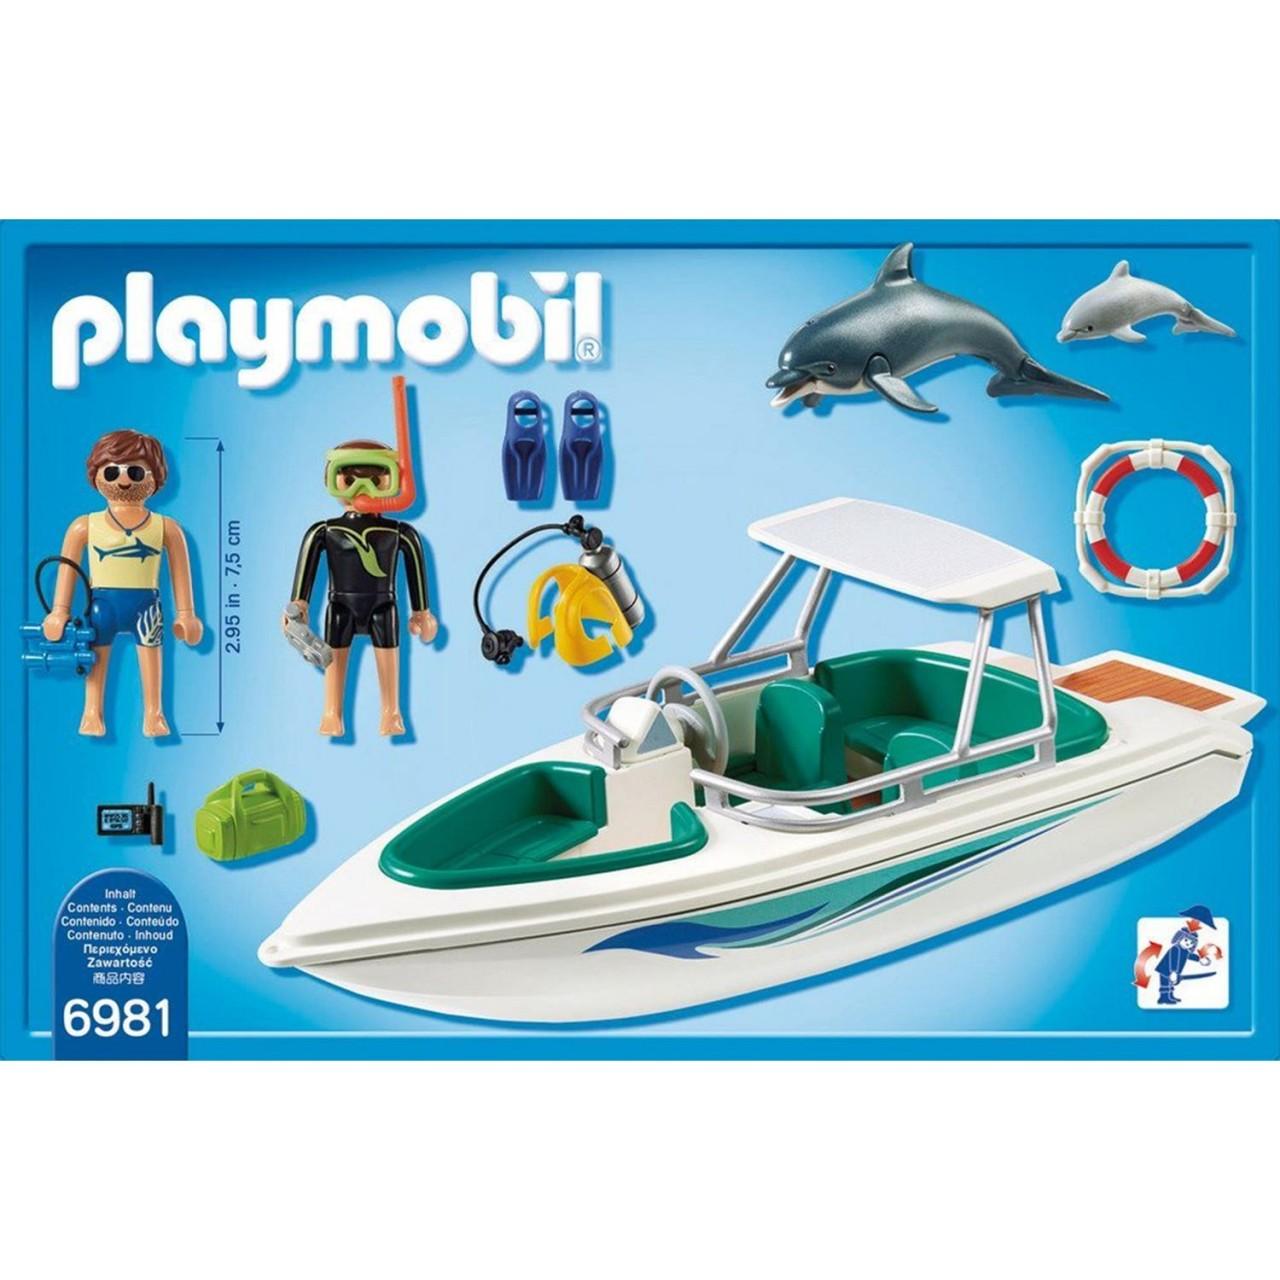 Playmobil 6981 Tauchausflug mit Sportboot